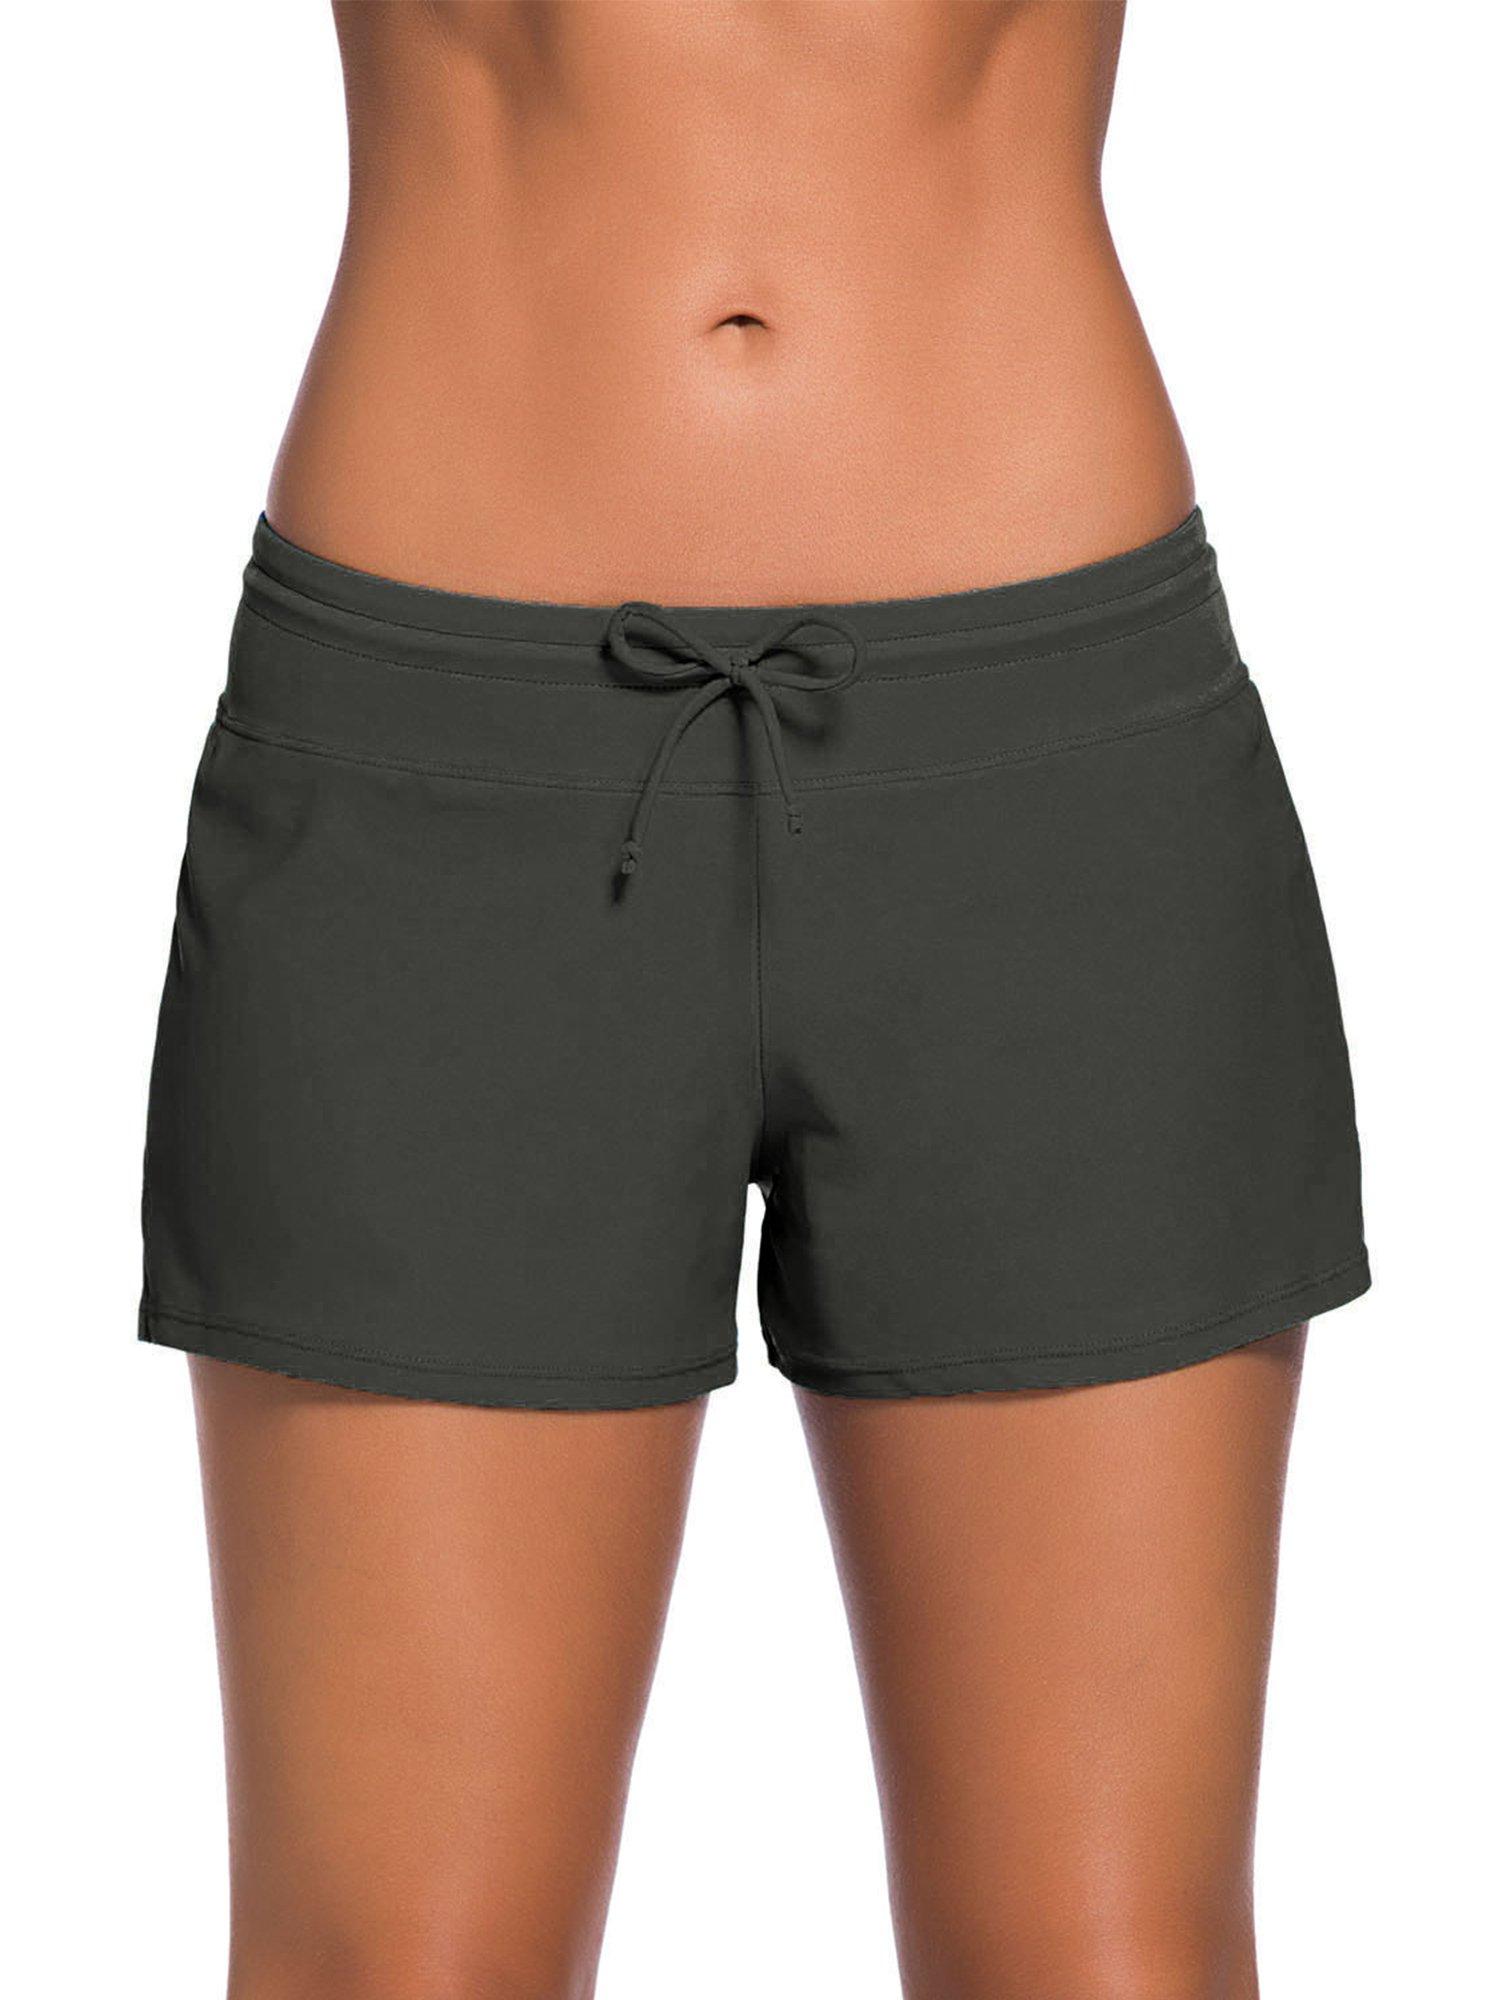 Satinior Women Swimsuit Shorts Tankini Swim Briefs Side Split Plus Size Bottom Boardshort Summer Beach Swimwear Trunks (S Size, Grey)